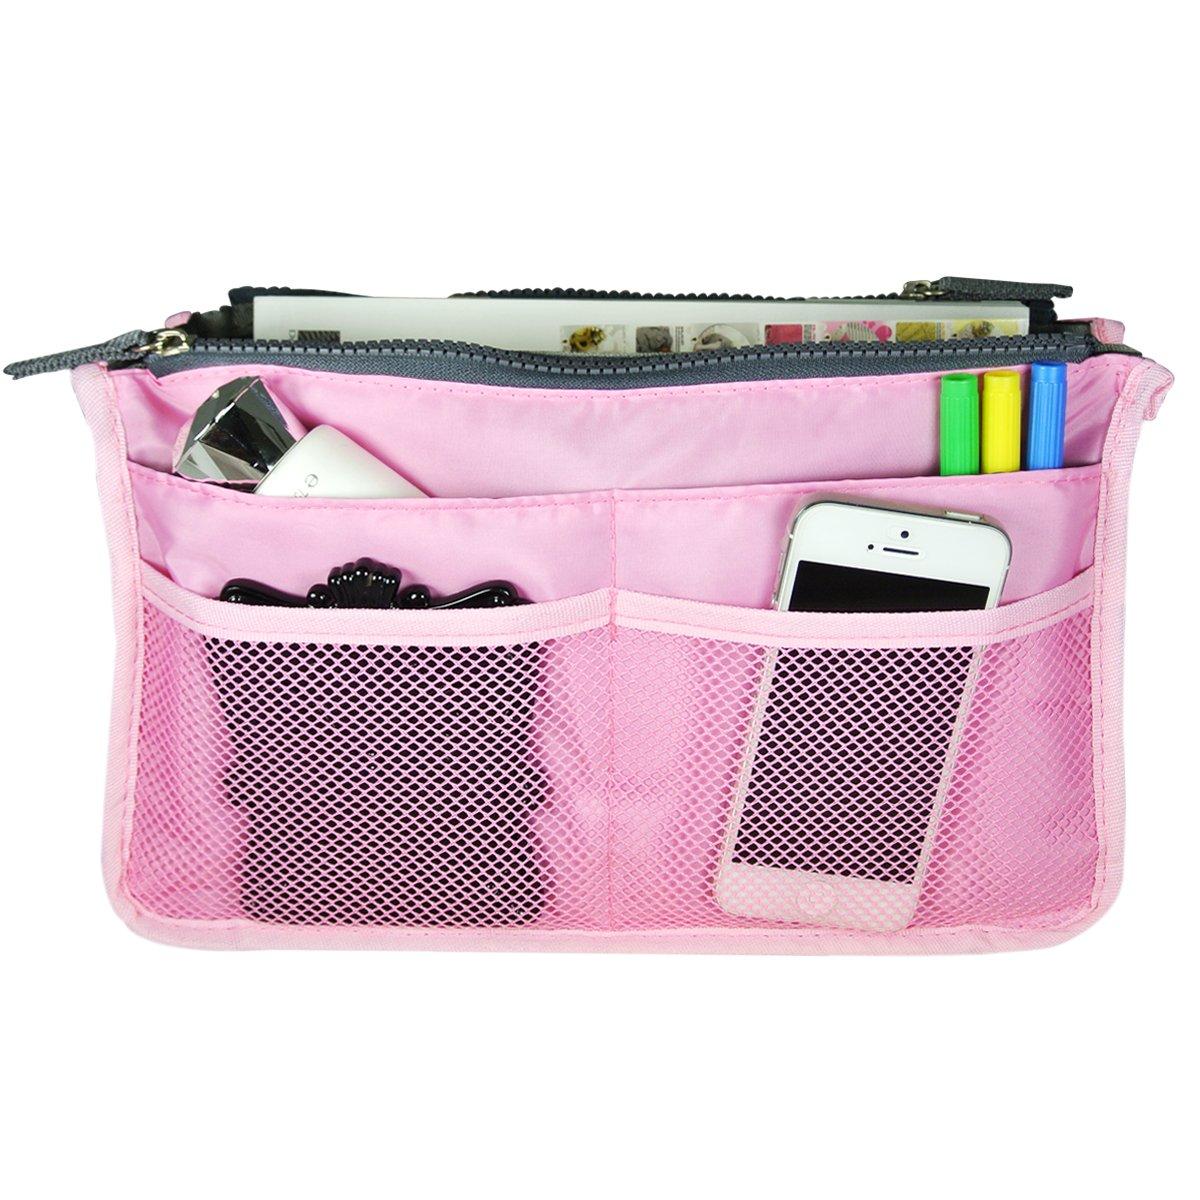 Bag Organizer Purse Cheap SALE Start Insert Pink Max 67% OFF Handbag Travel